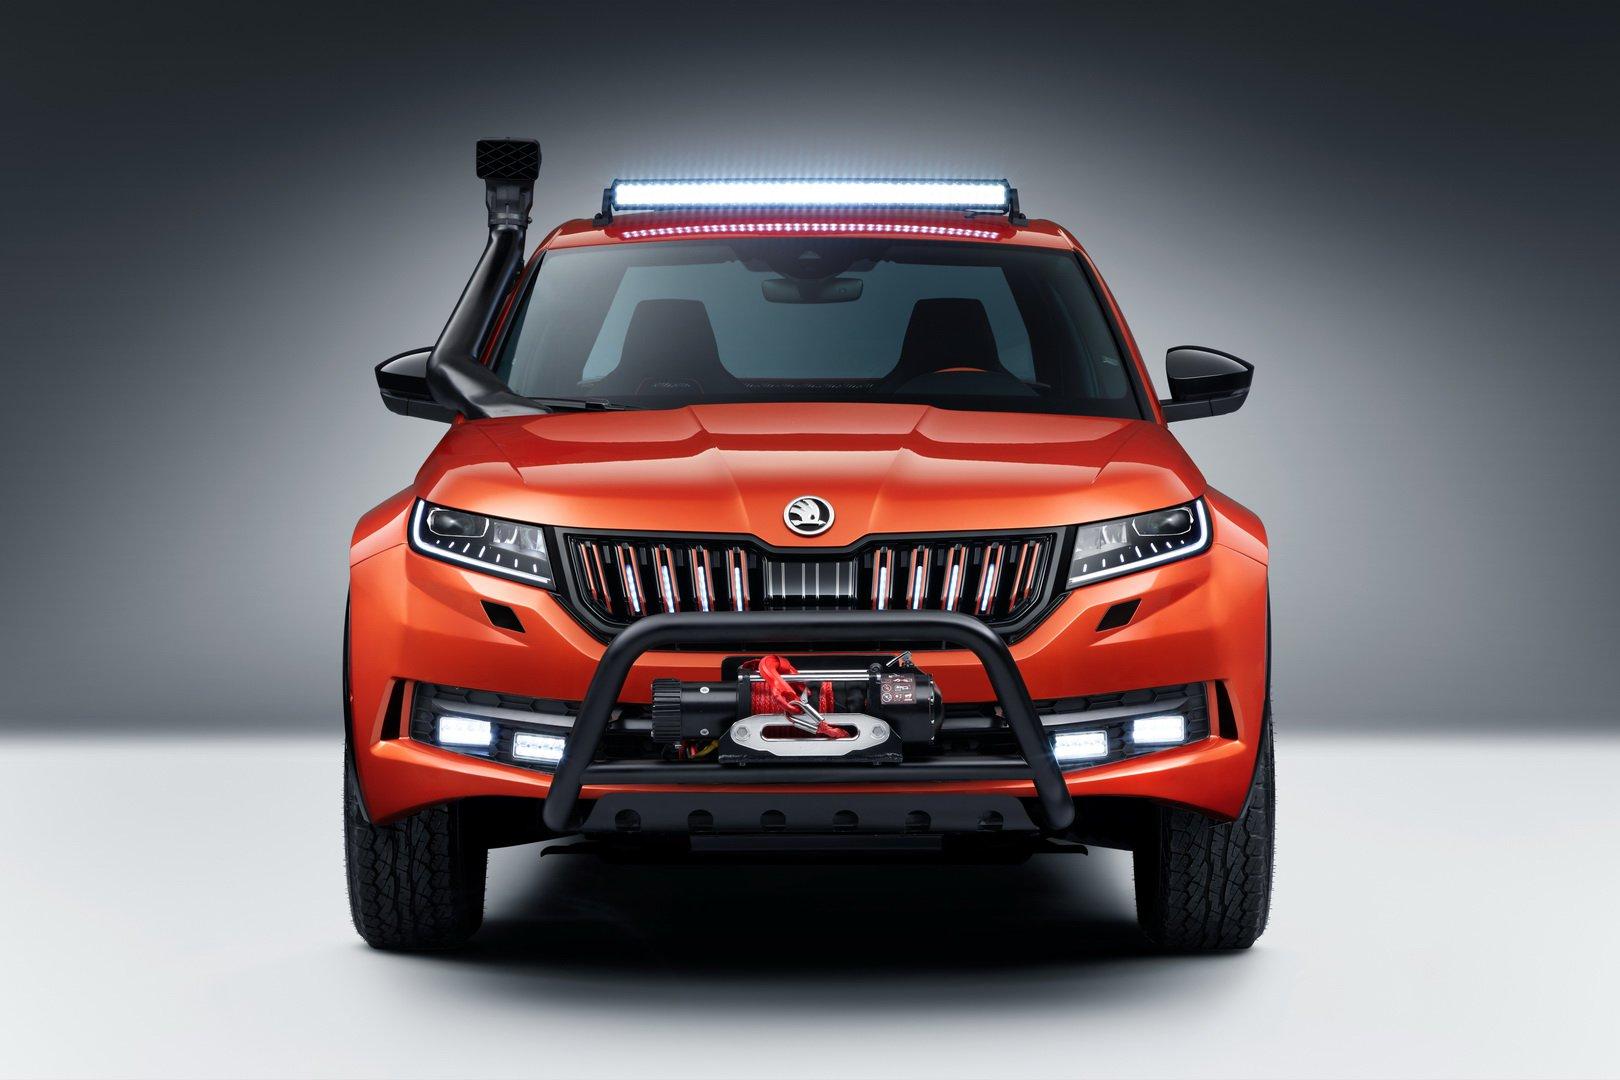 Skoda Mountiaq rival Dacia Duster pick-up (9)